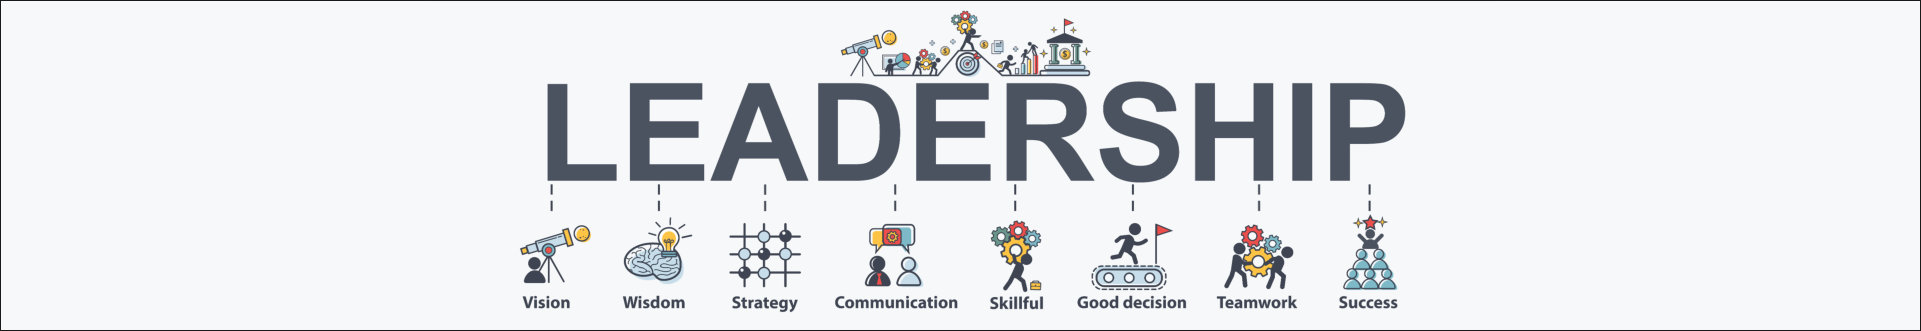 Leadership banner